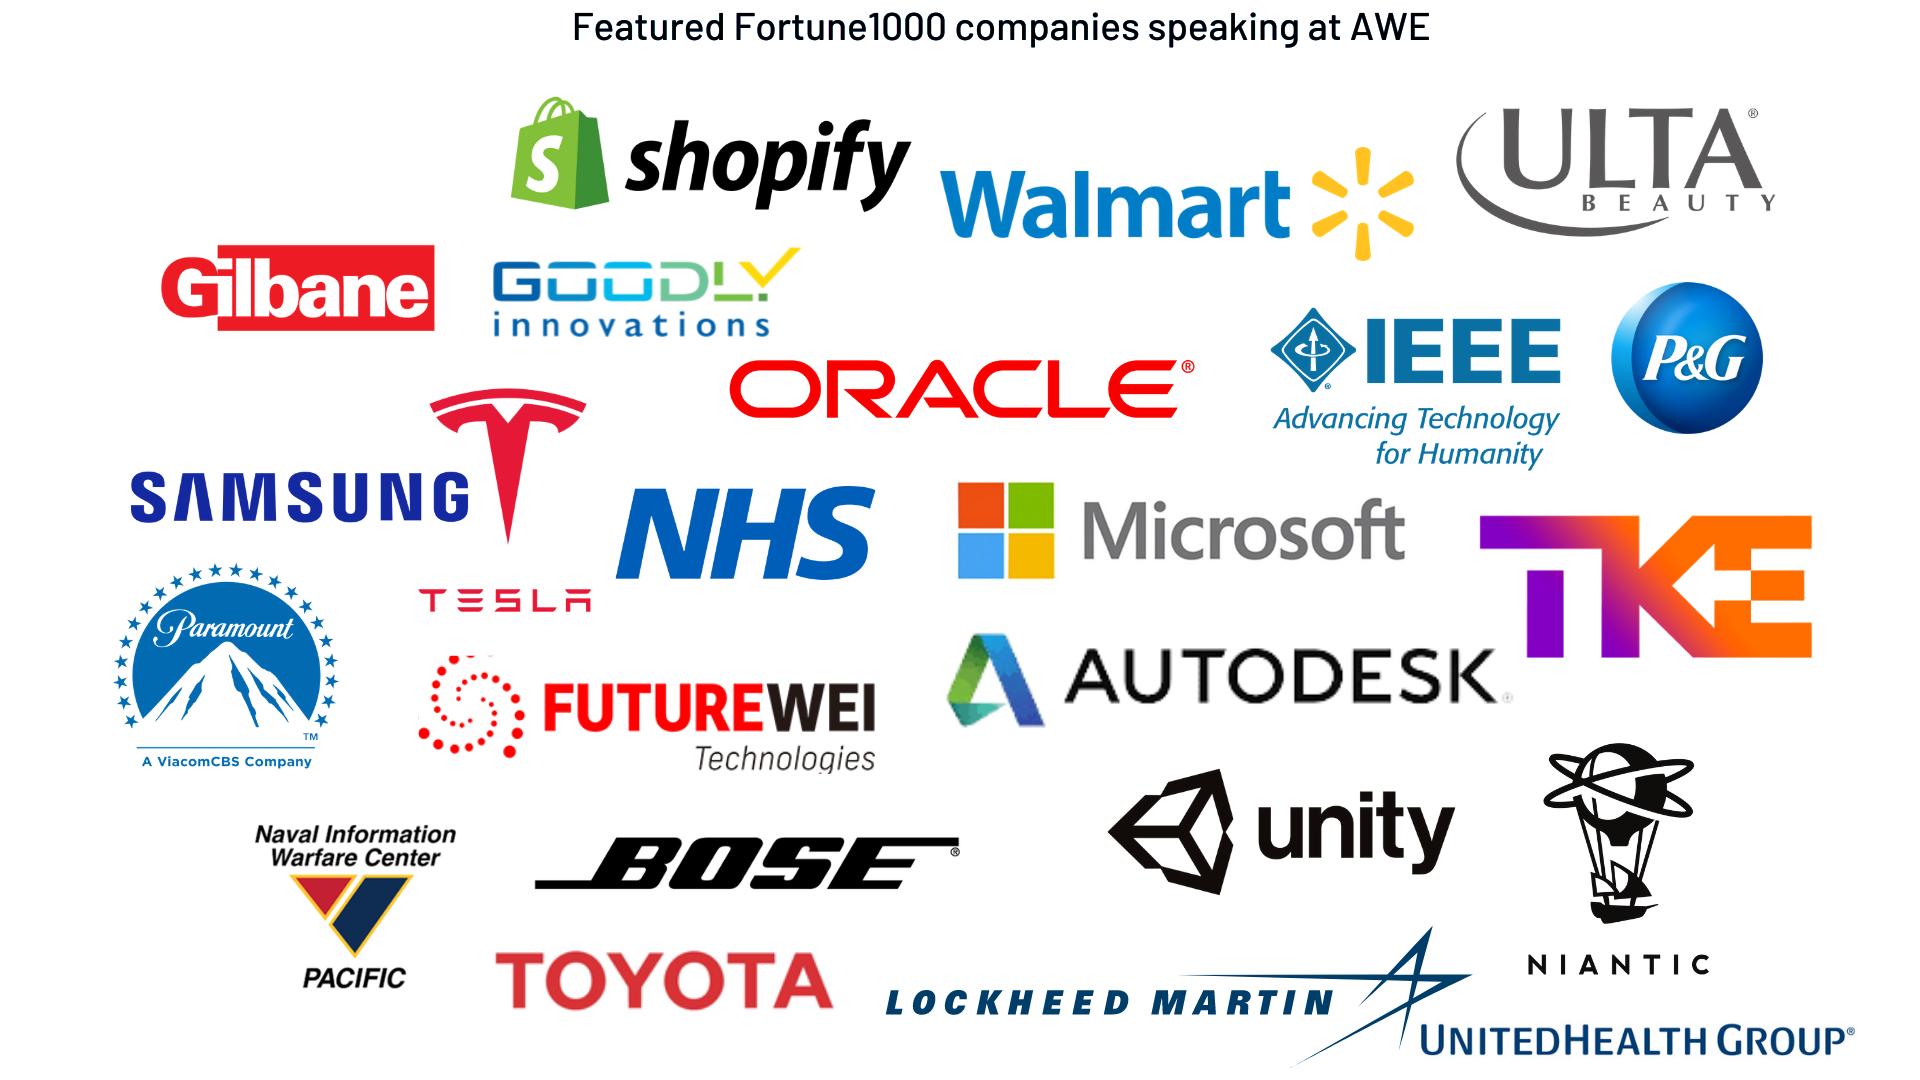 Speaker companies at AWE